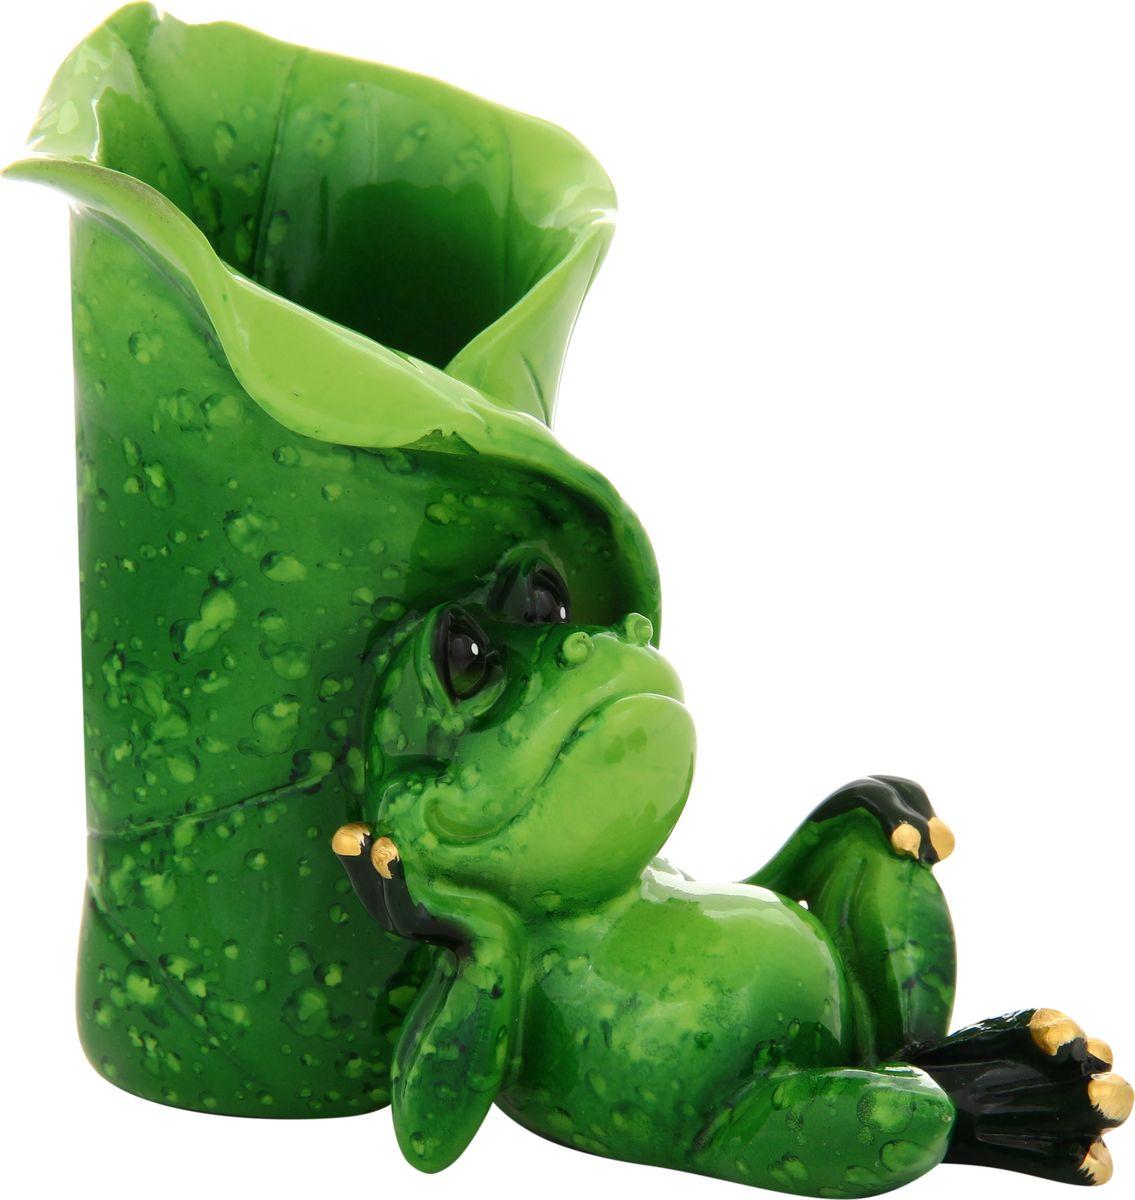 Фигурка декоративная Elan Gallery Лягушка подставка под карандаши, 10 х 9,5 см фигурки elan gallery фигурка лягушка модница